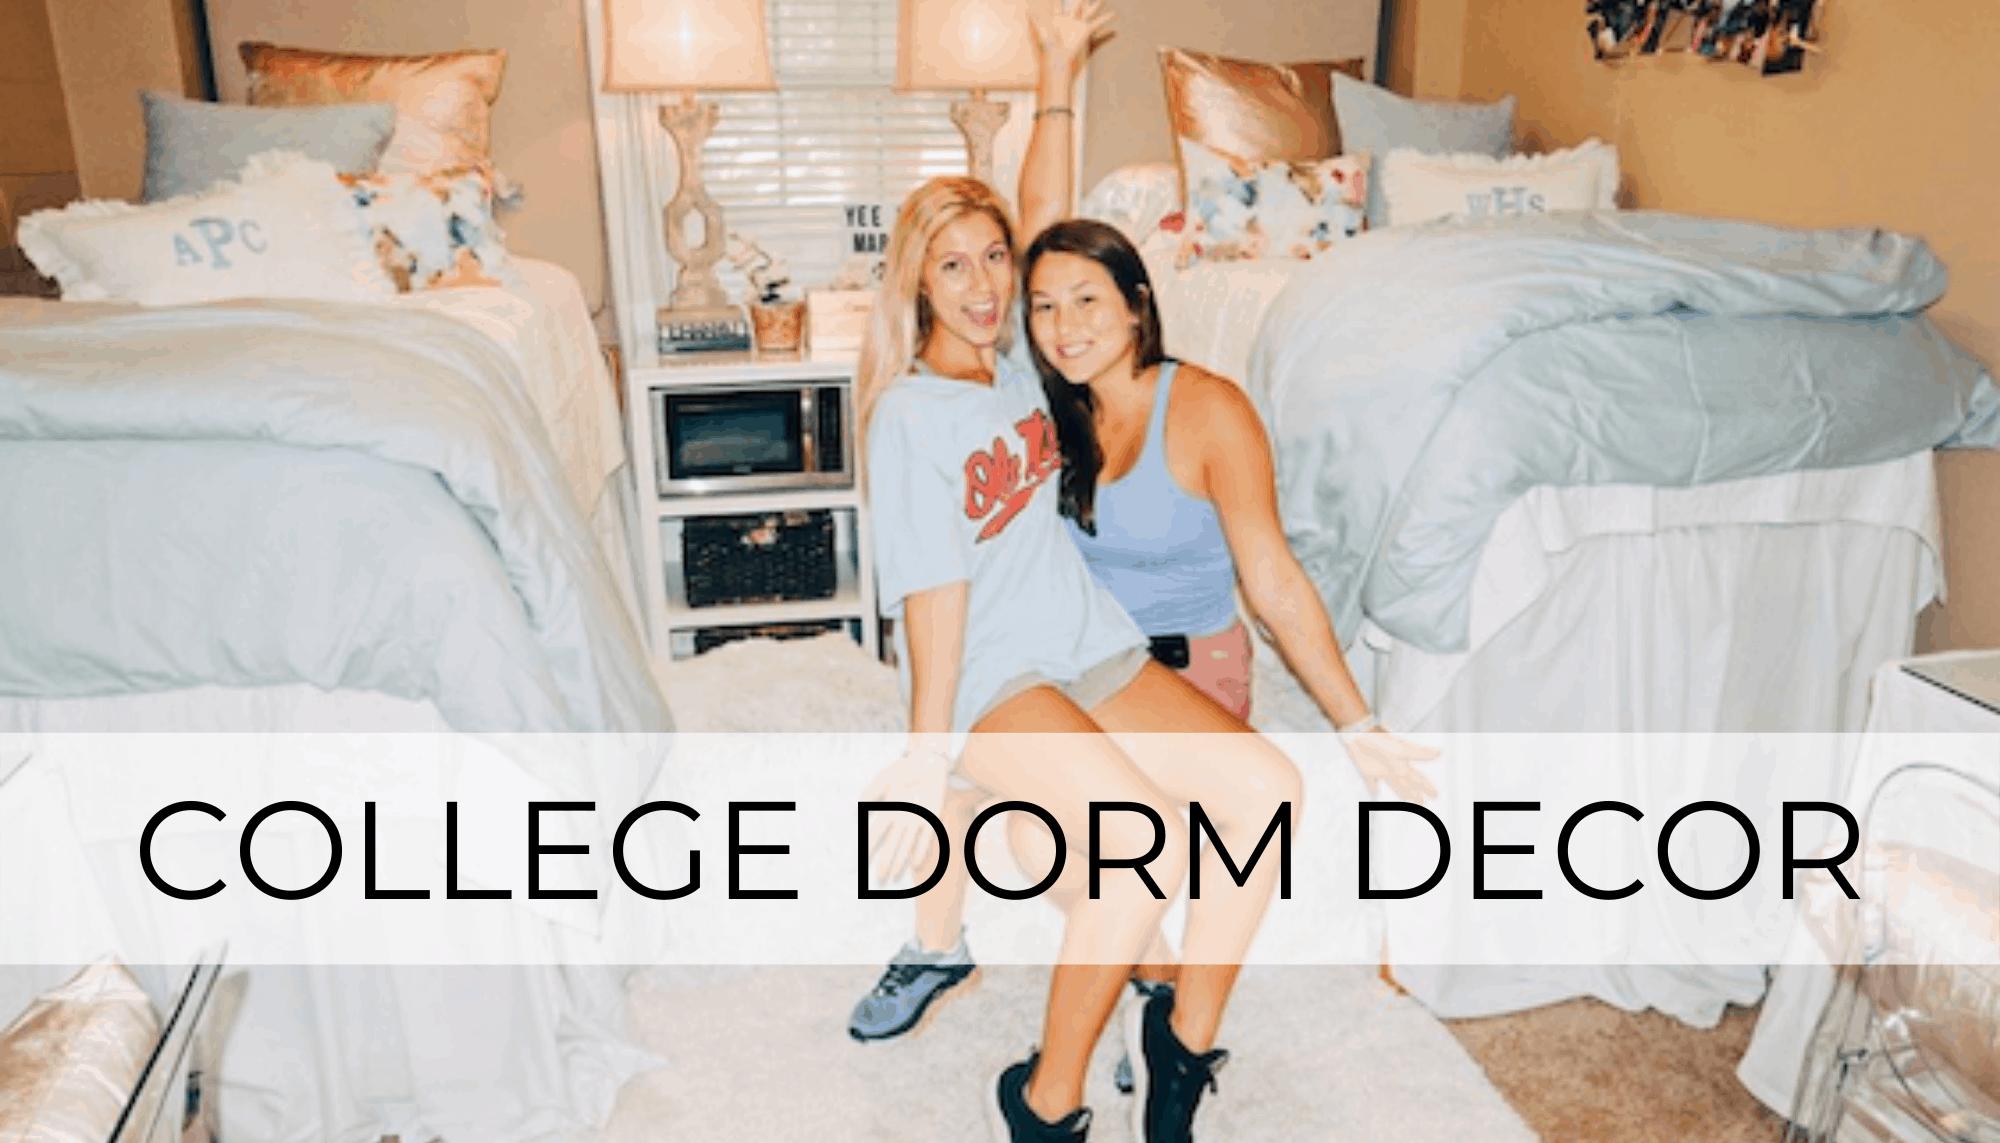 College Dorm Decor